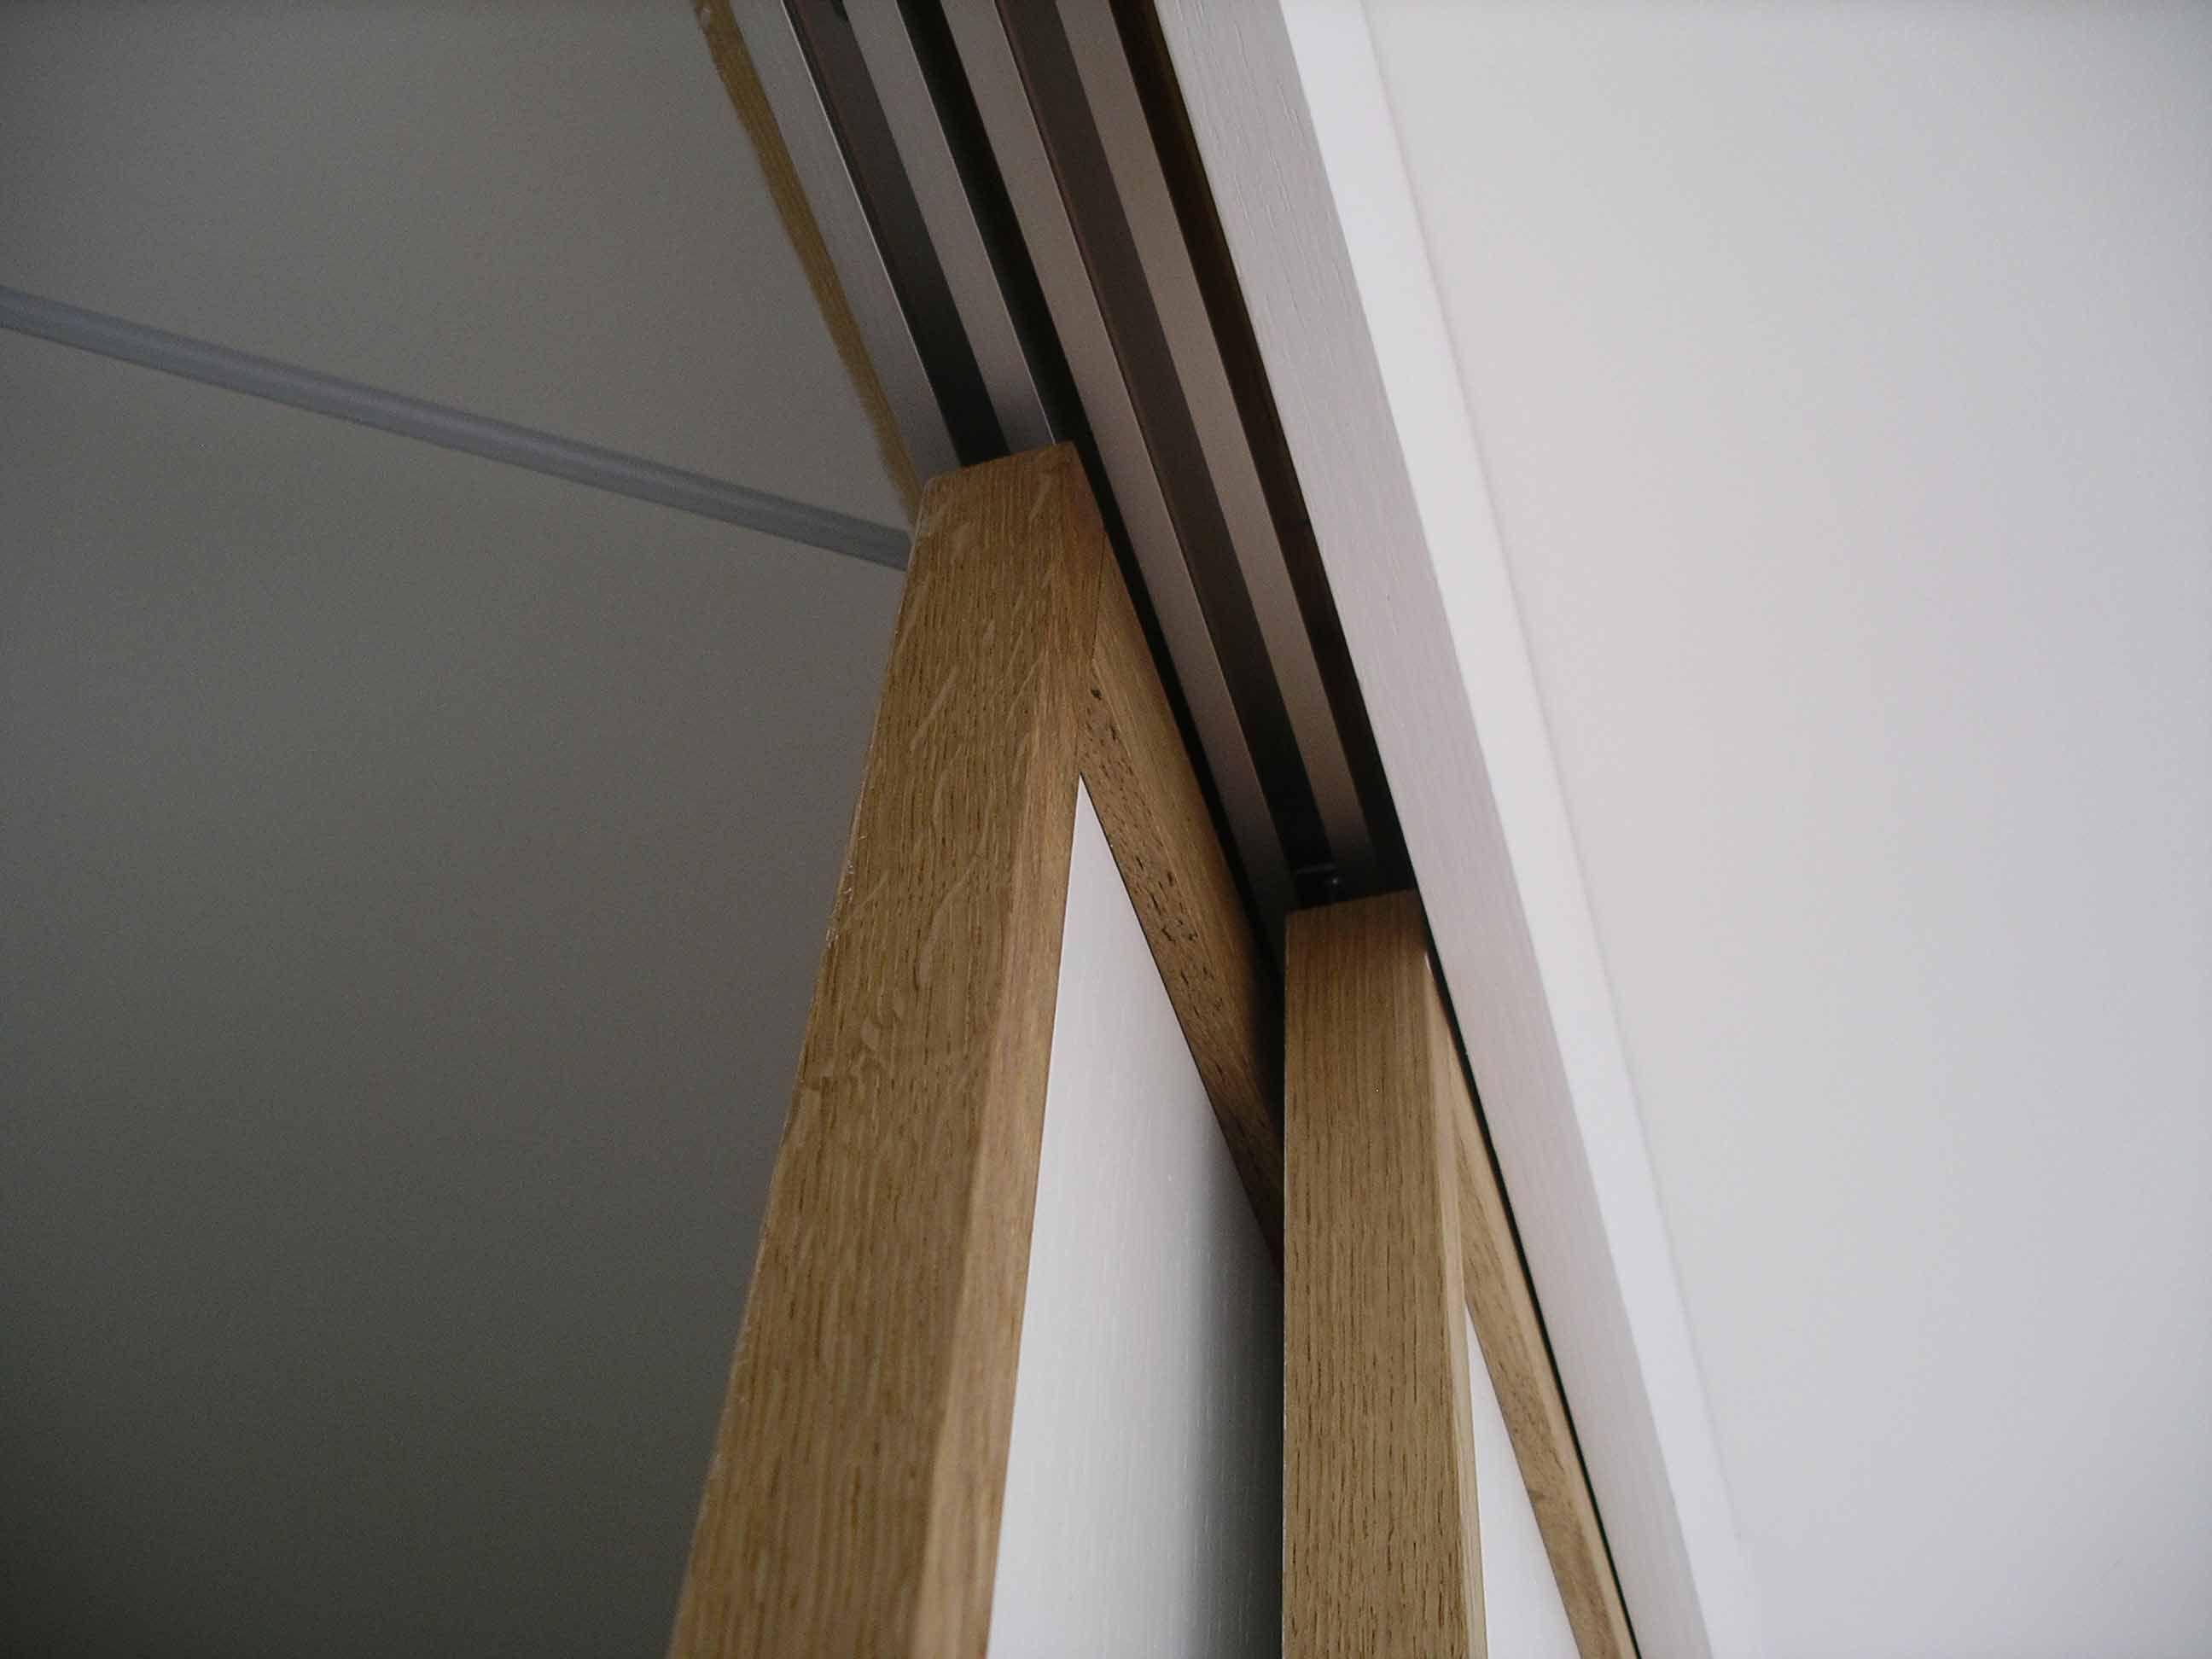 japanese sliding doors bespoke made wardrobe by peter henderson furniture brighton uk